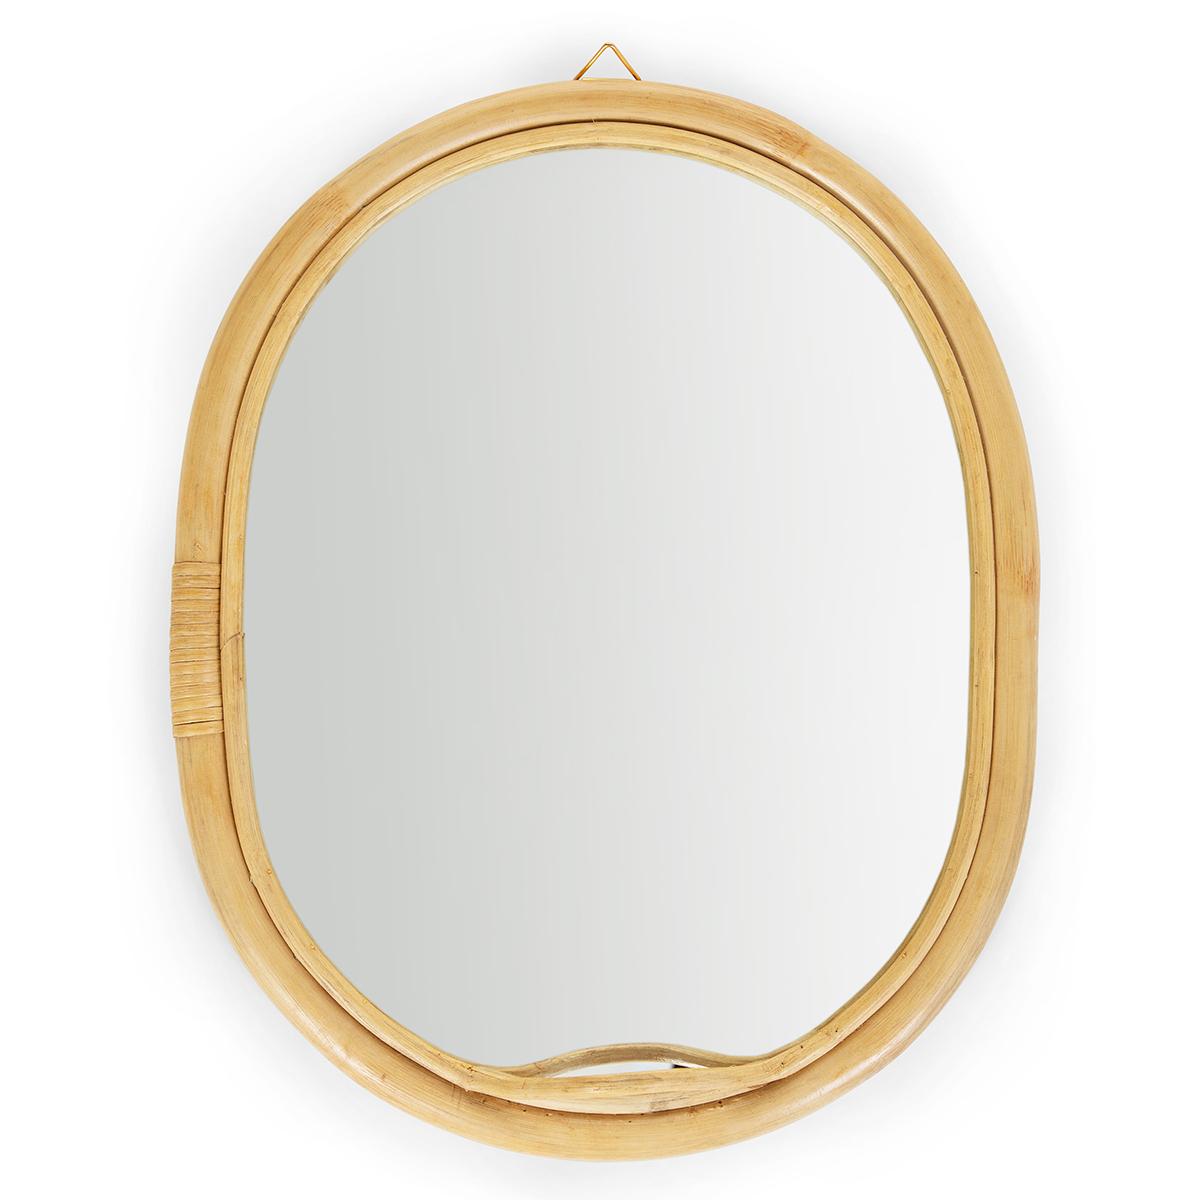 Miroir Miroir Ovale en Rotin Miroir Ovale en Rotin